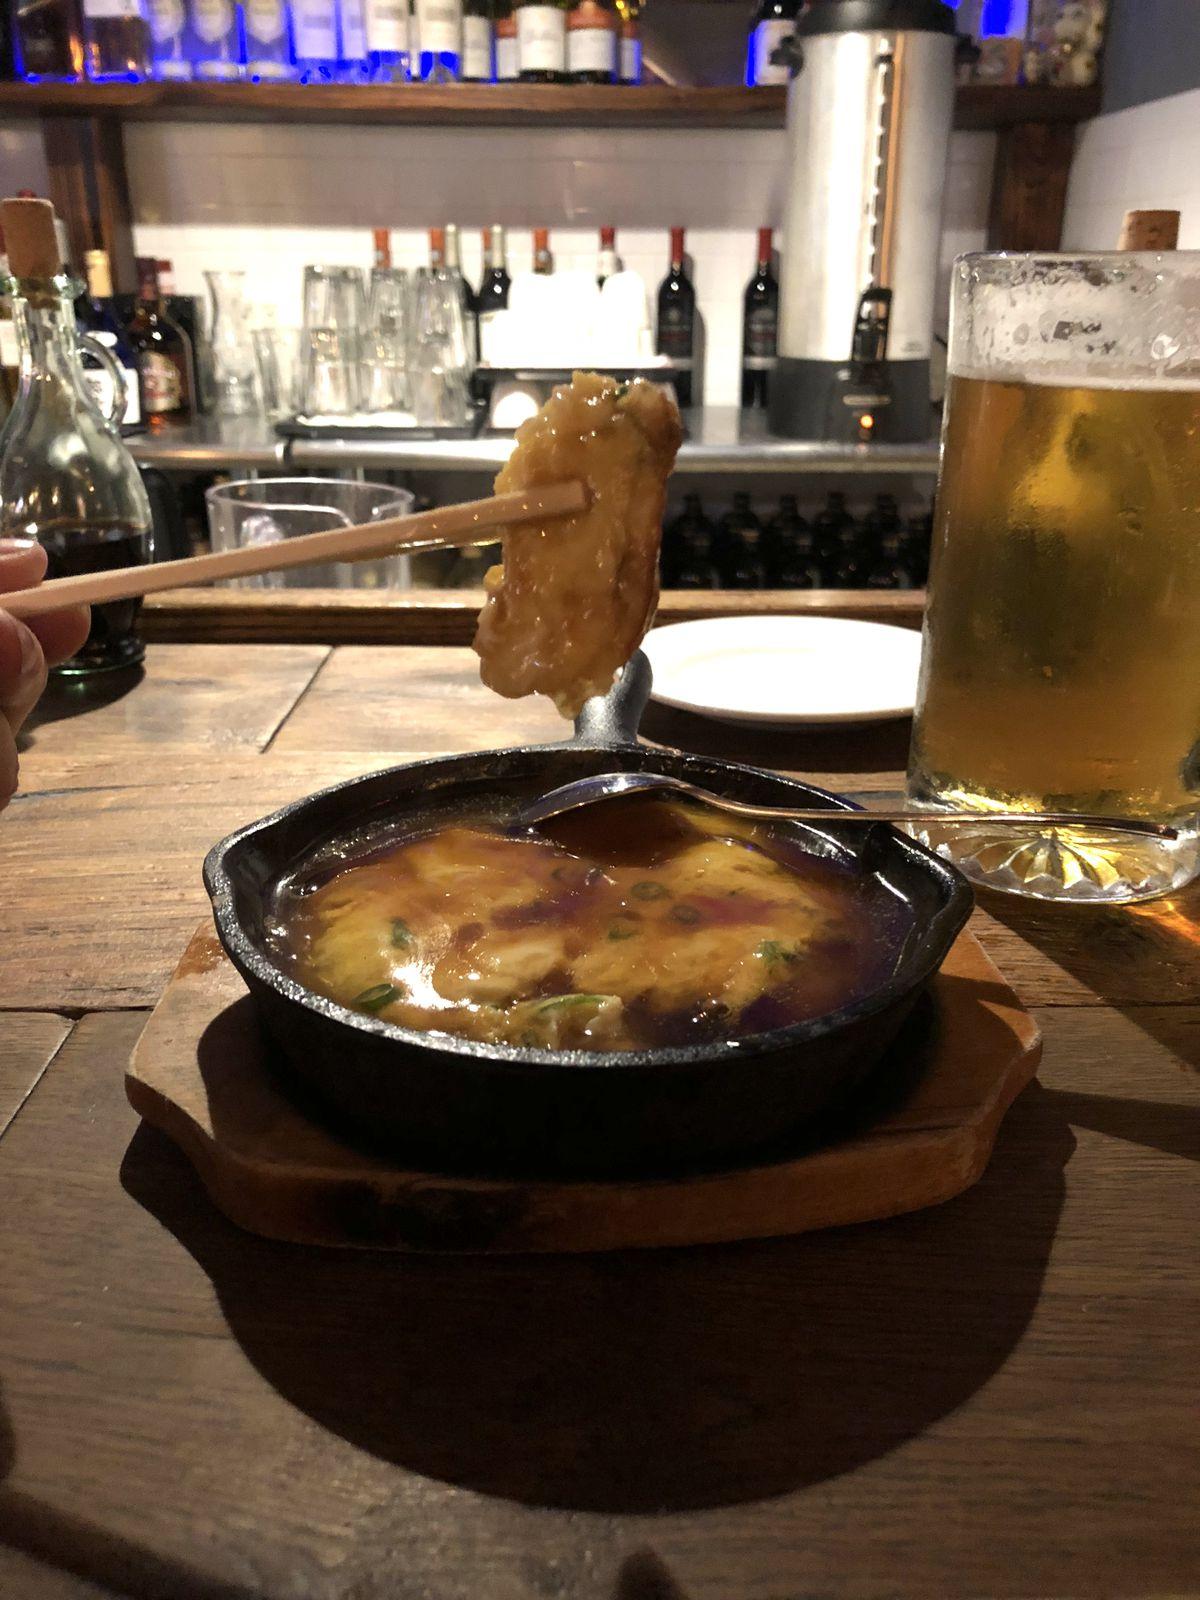 Sizzling crab omelet at Donburiya